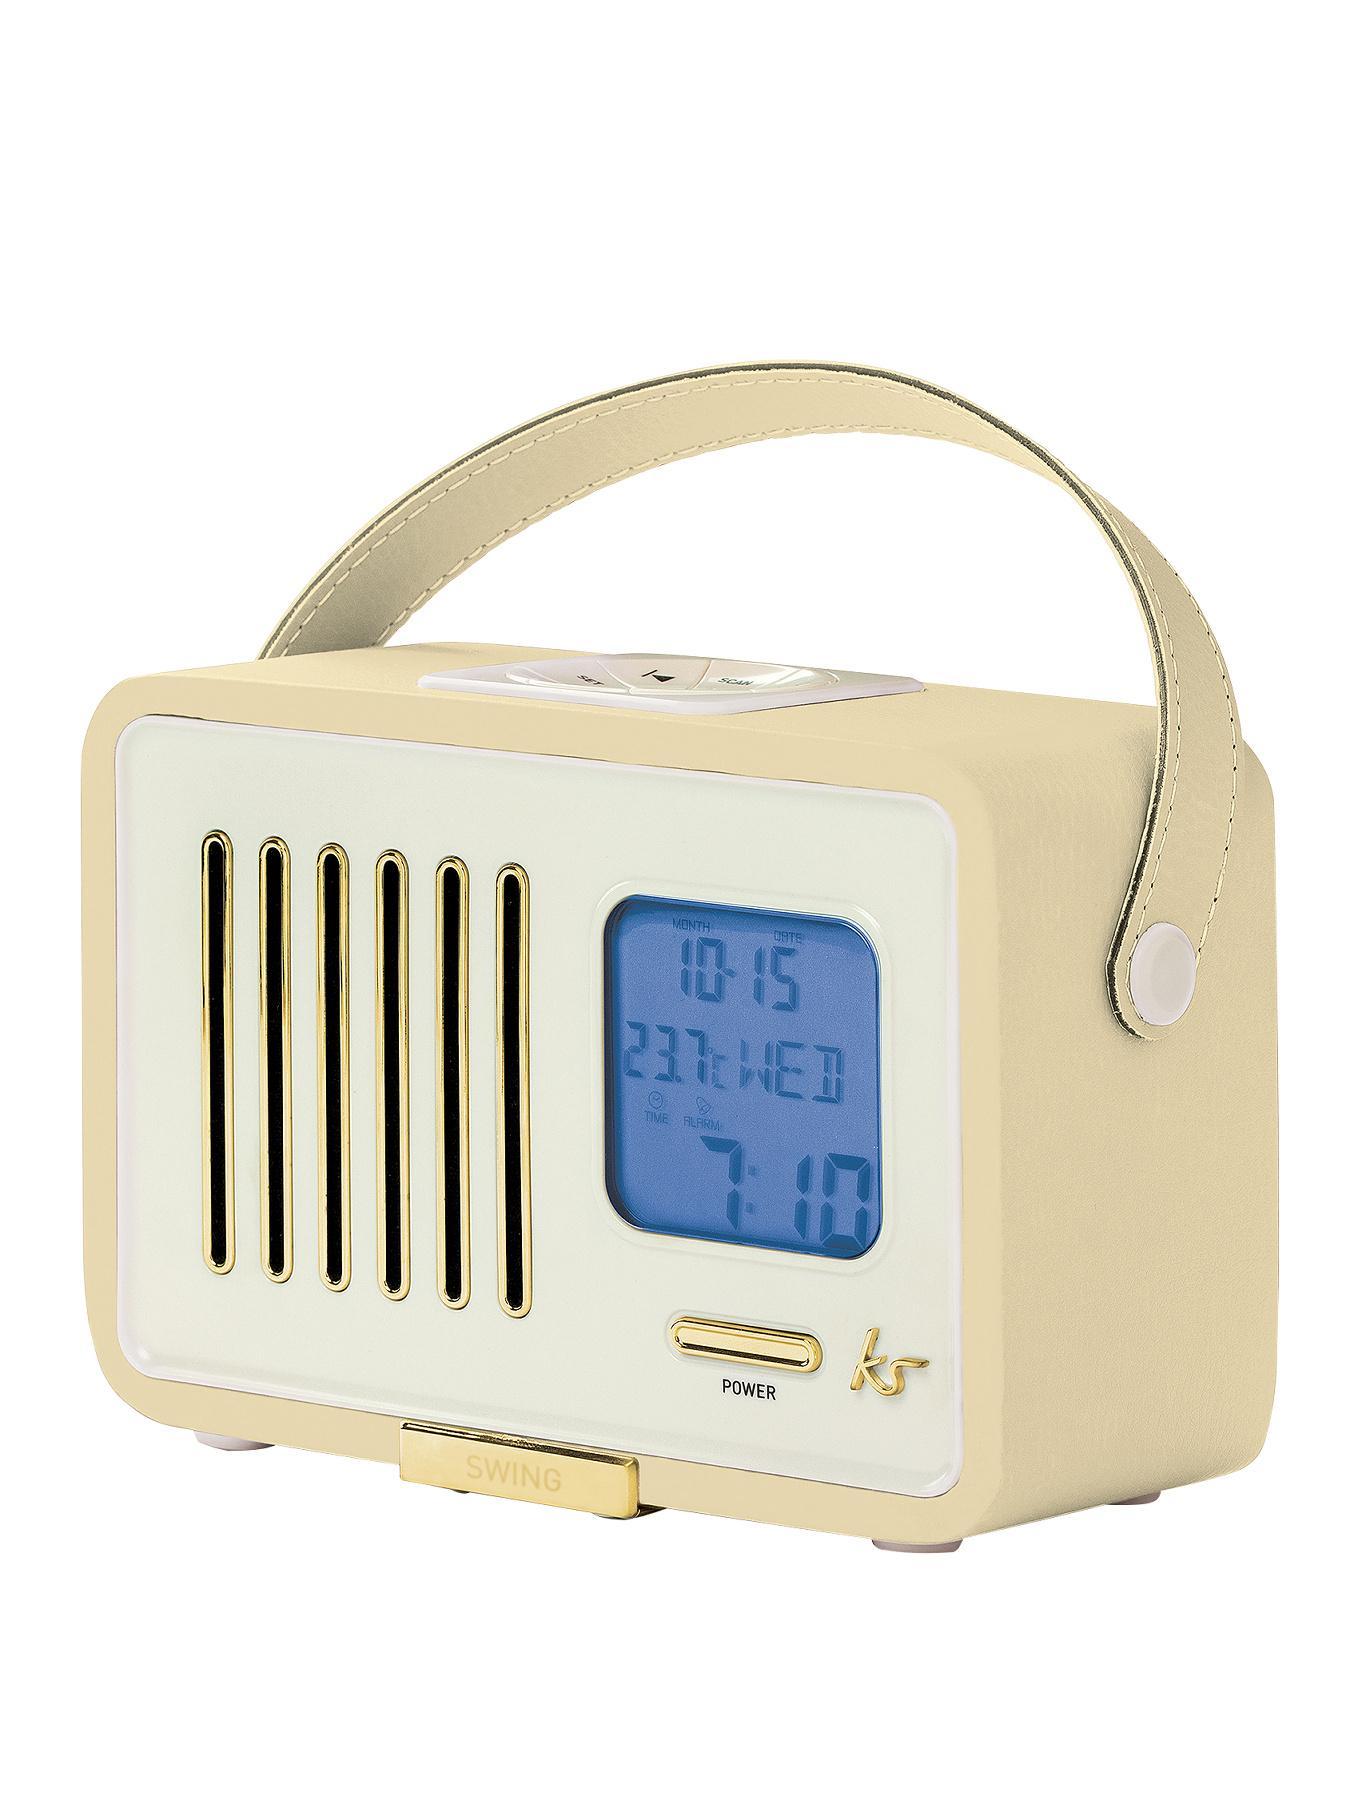 Kitsound Swing FM Radio with Alarm Clock